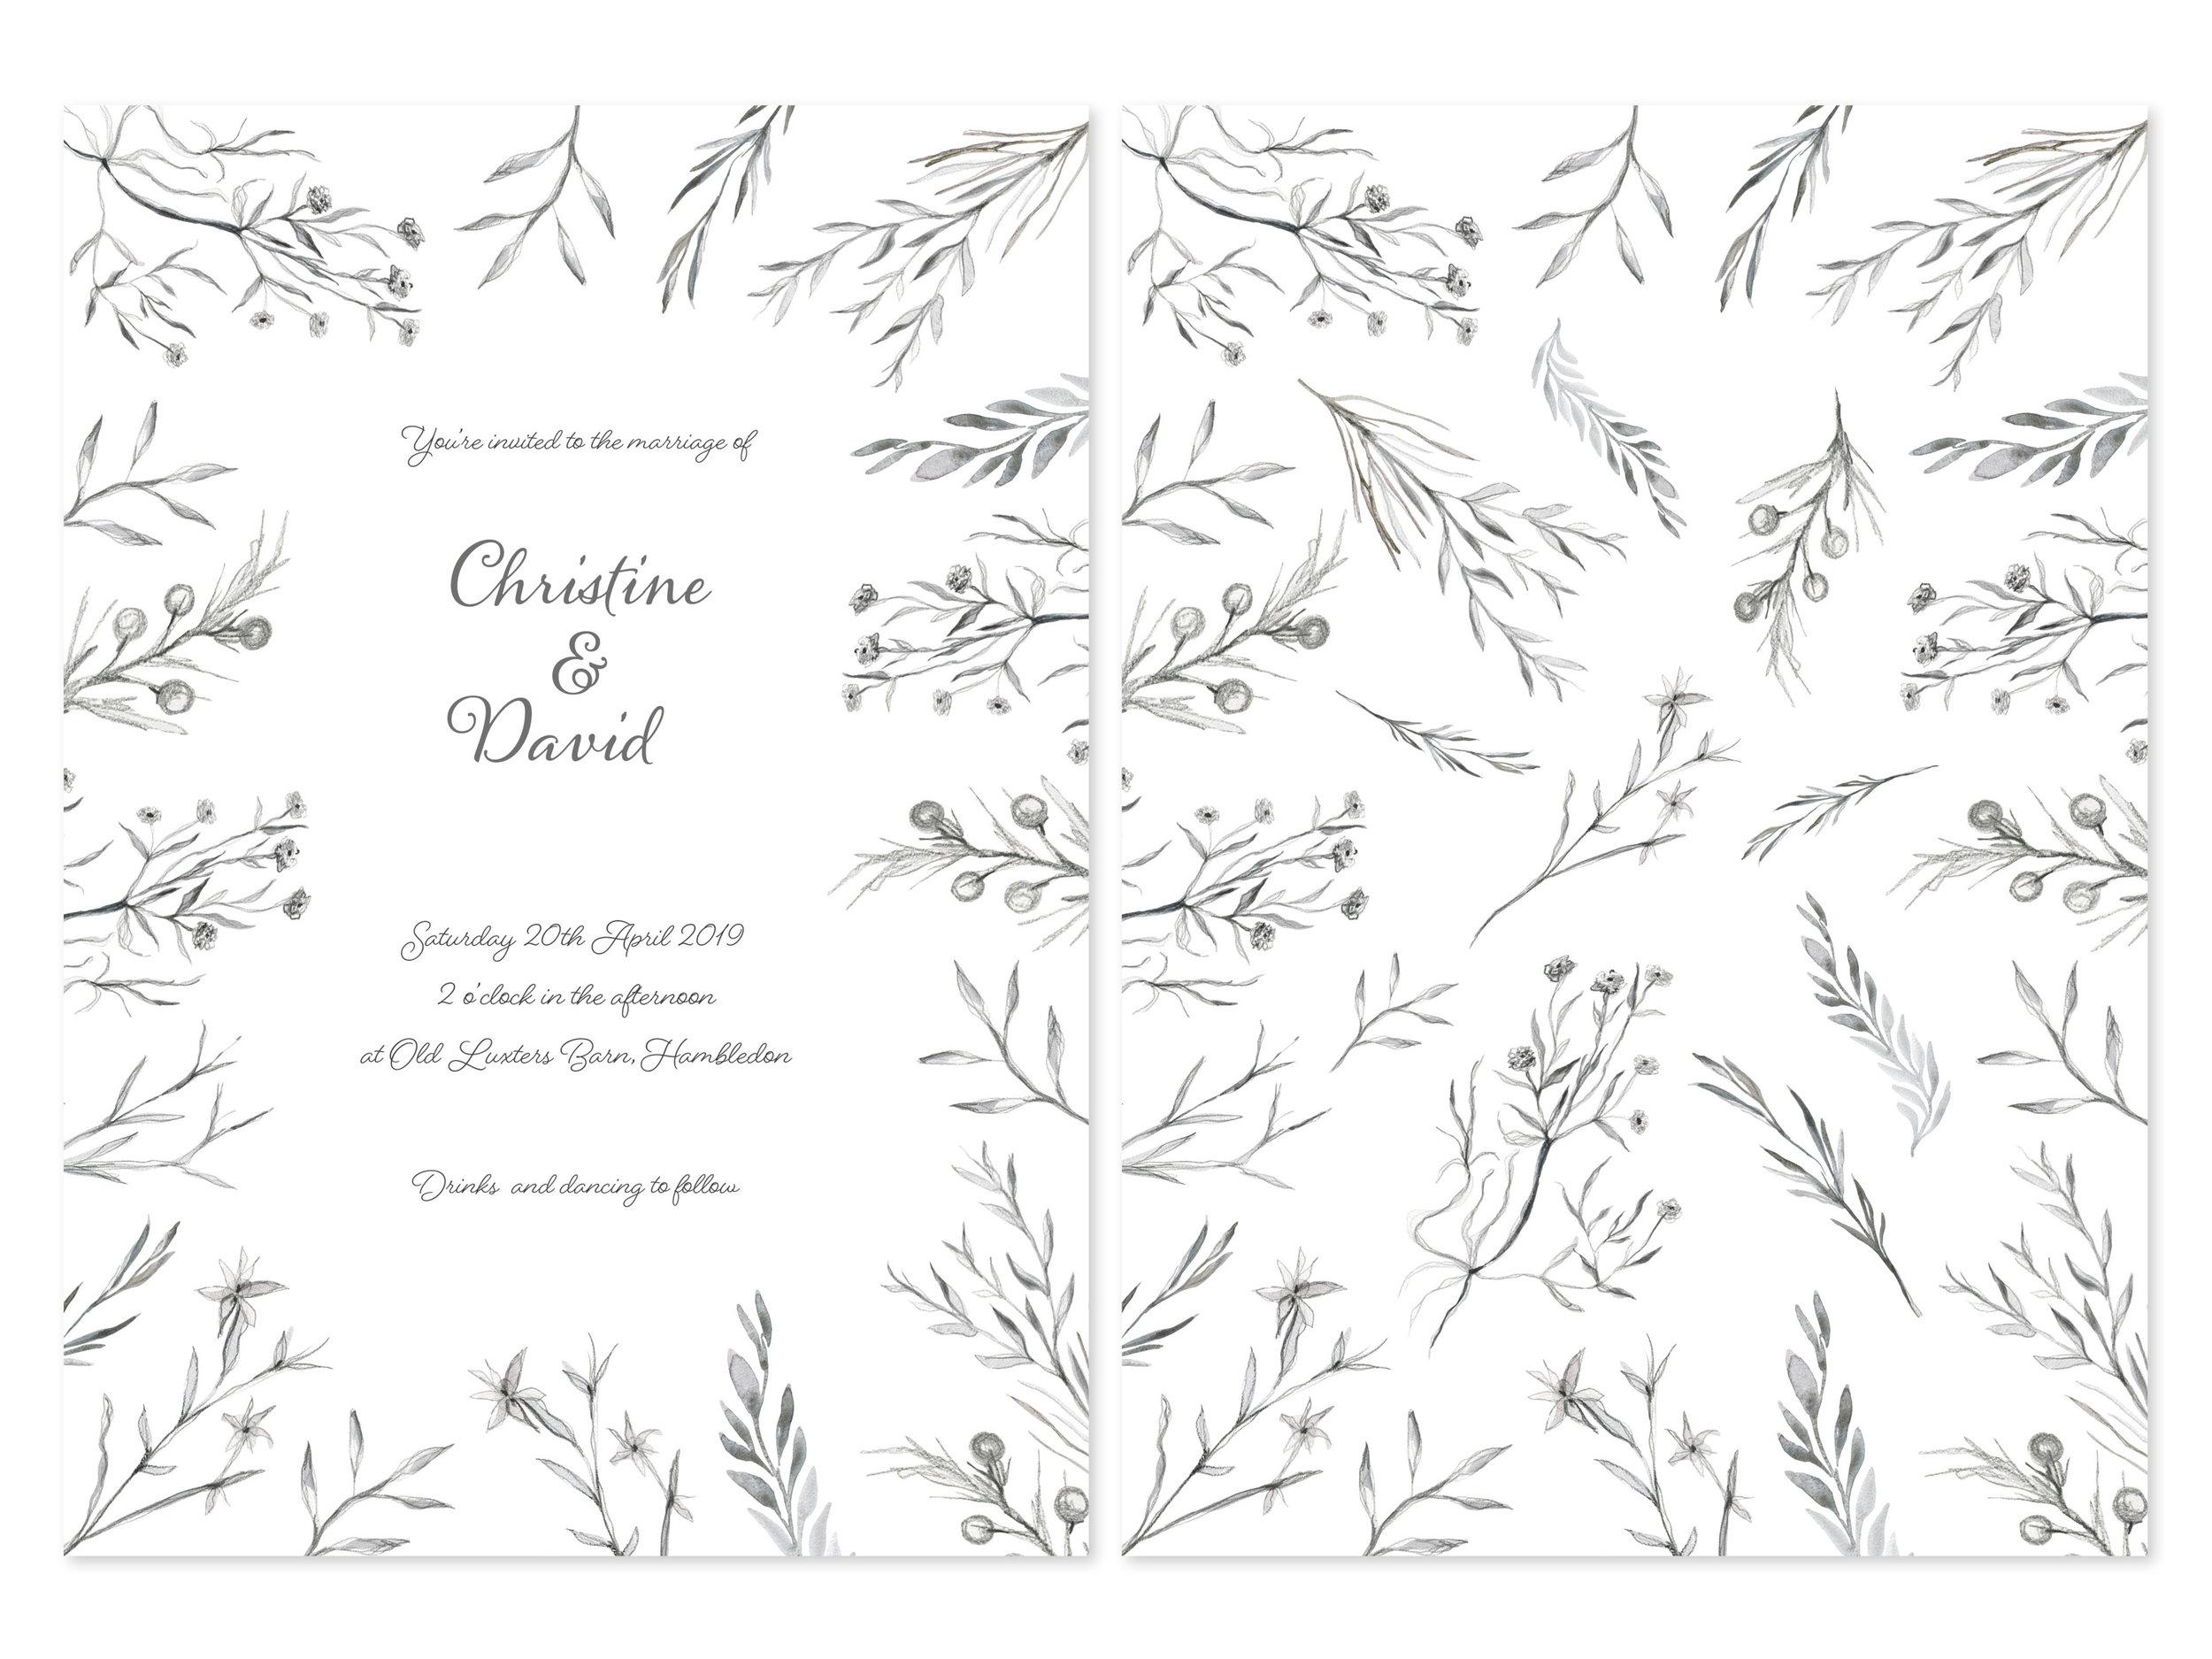 RockandInk_Dusty_weddinginvite_layout.jpg